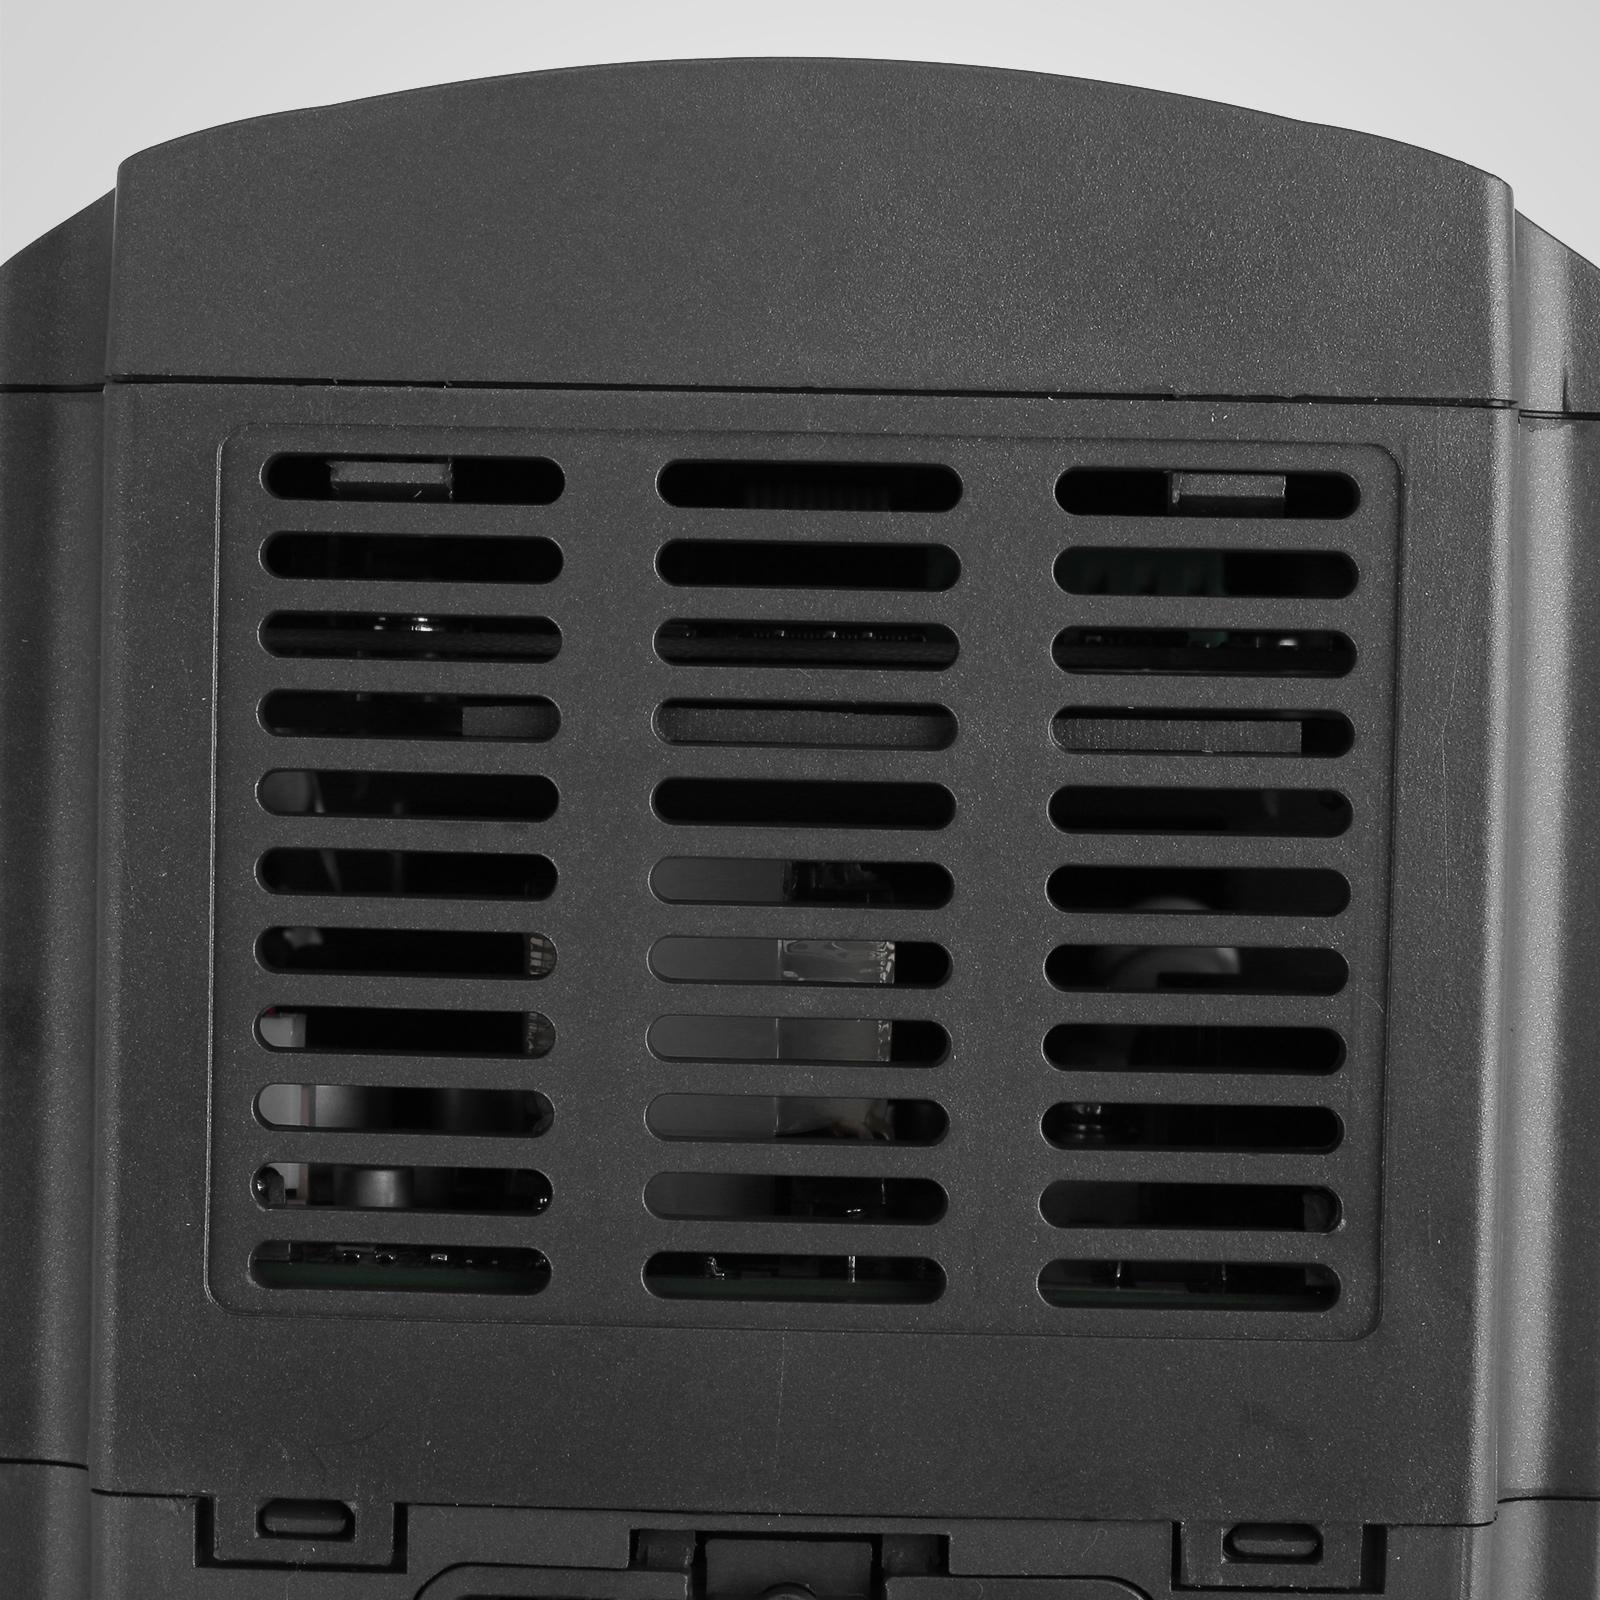 Danfoss Vlt Drive Wiring Diagram Best Image 2018 Vfd Diagrams Schematics Why Do We Need Variable Sd Drives Vsd 42 Elegant 2800 Tutorial Inverter